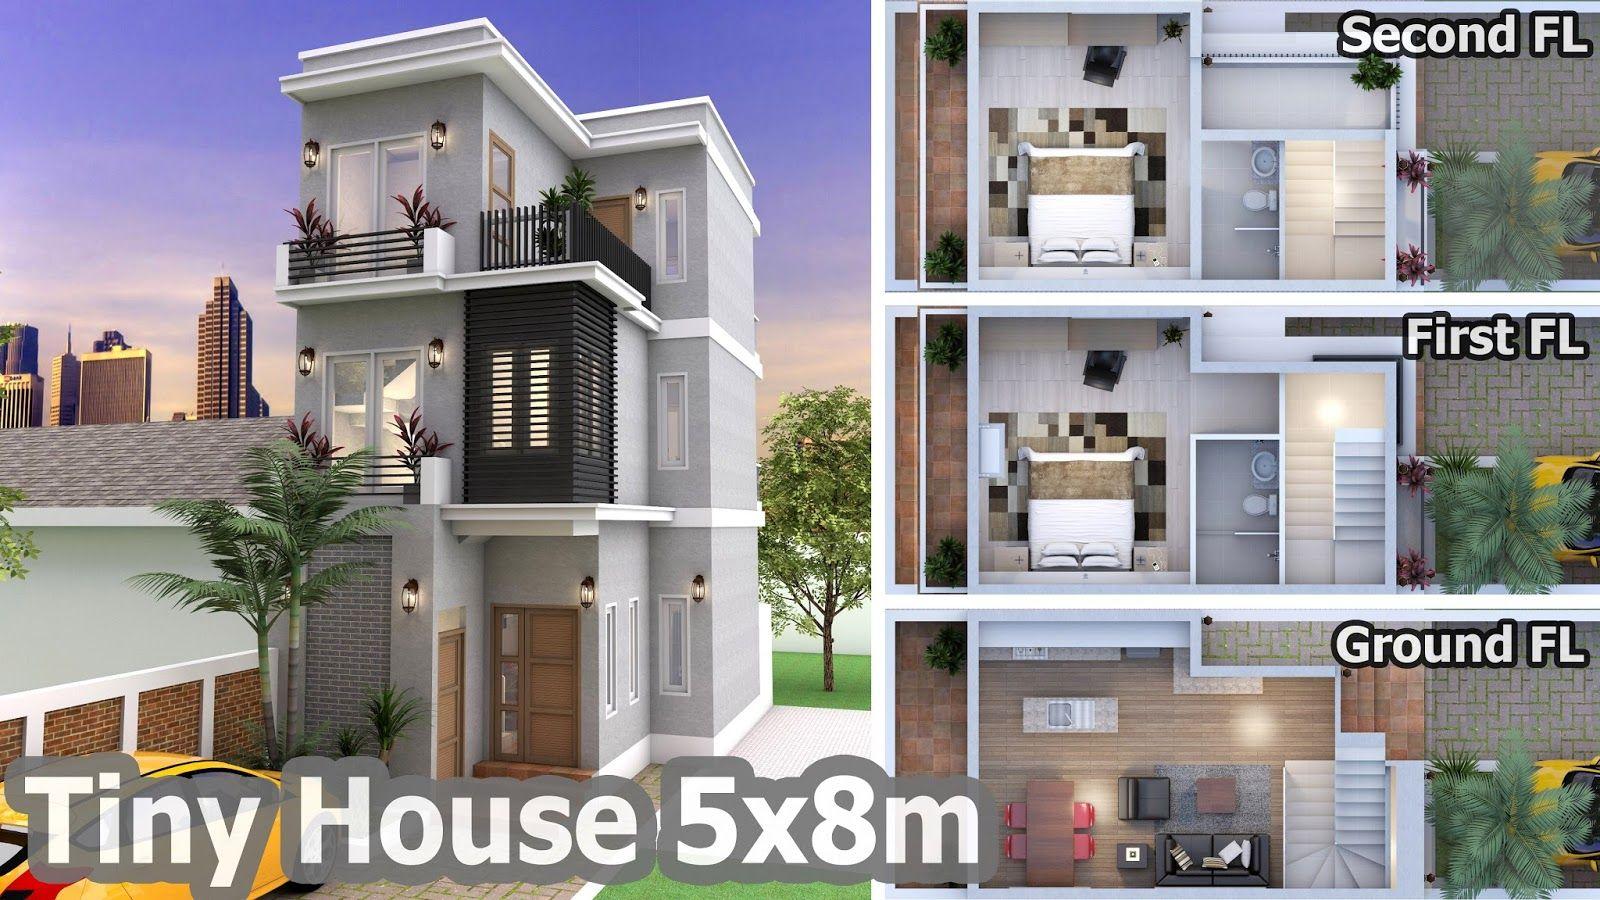 2 Bedroom Tiny Home Plan 5x8m Tiny House Plans Model House Plan House Plans